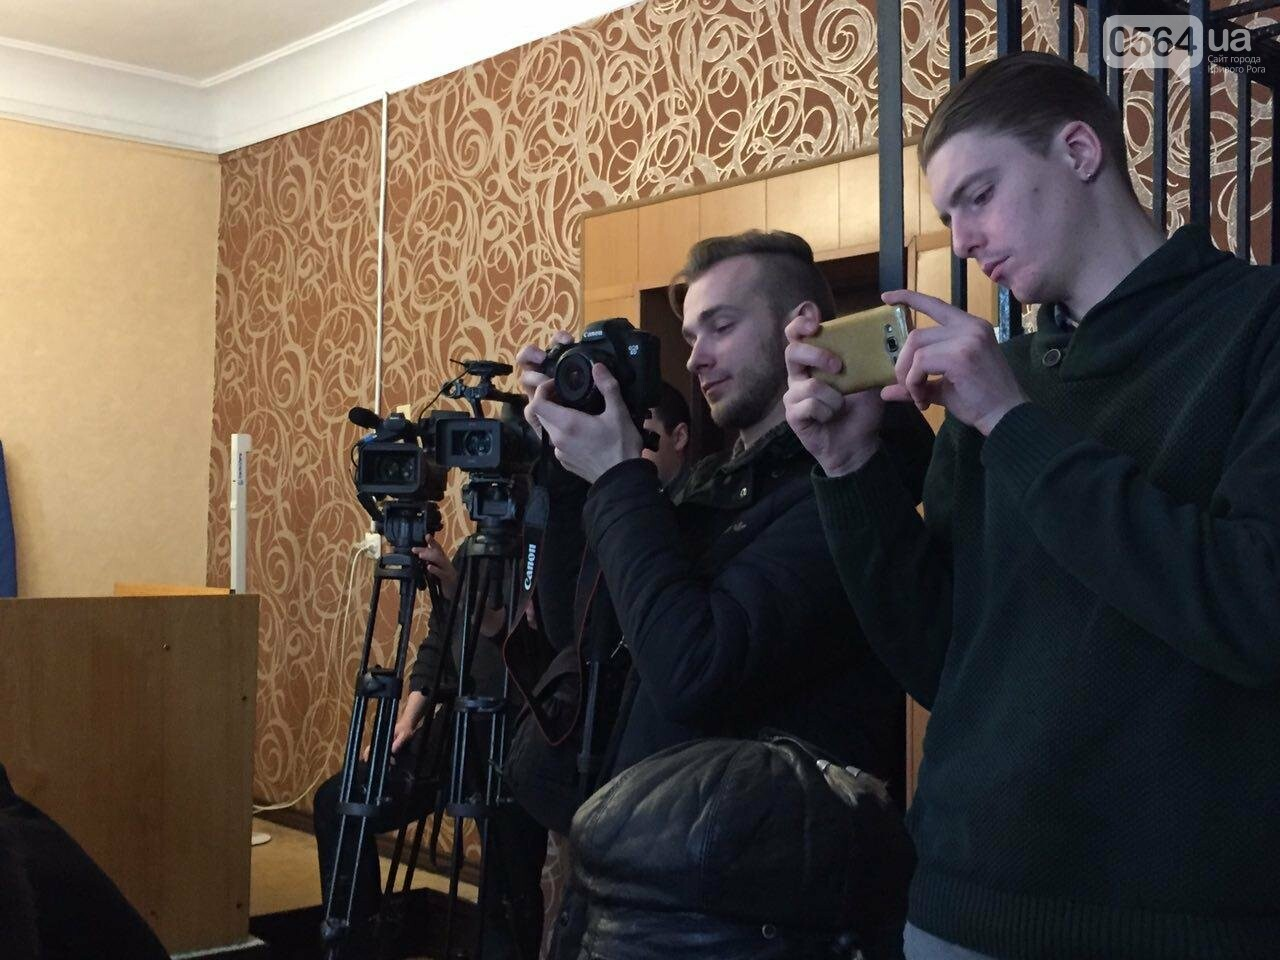 Криворожских журналистов в суде  допрашивают по делу Вячеслава Волка (ФОТО), фото-9